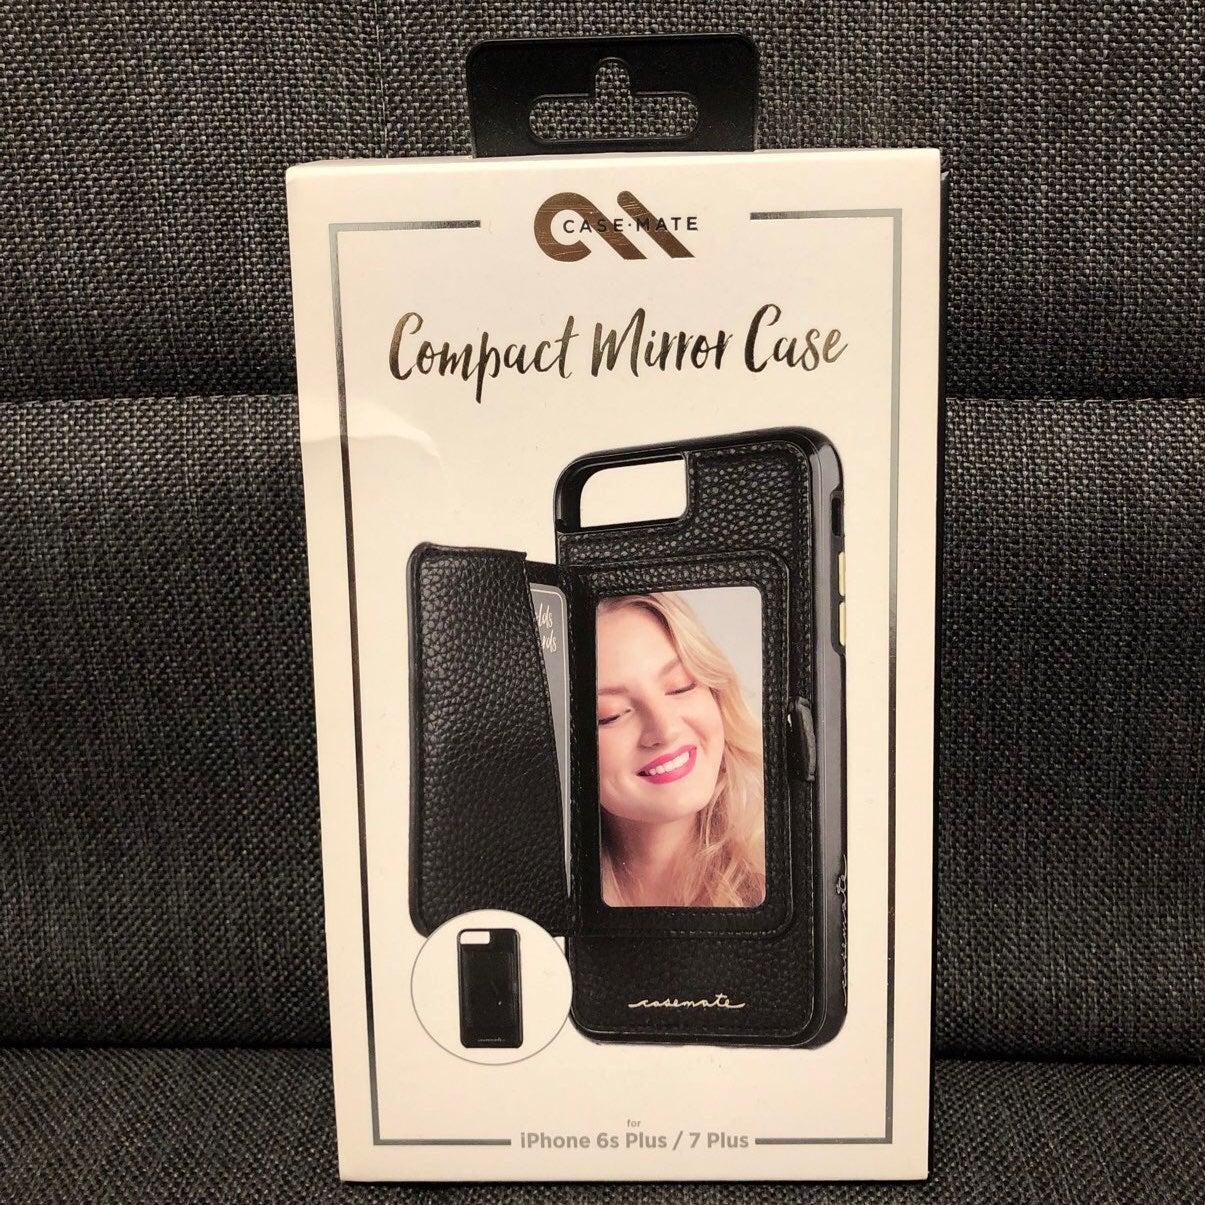 Casemate Compact Mirror Case